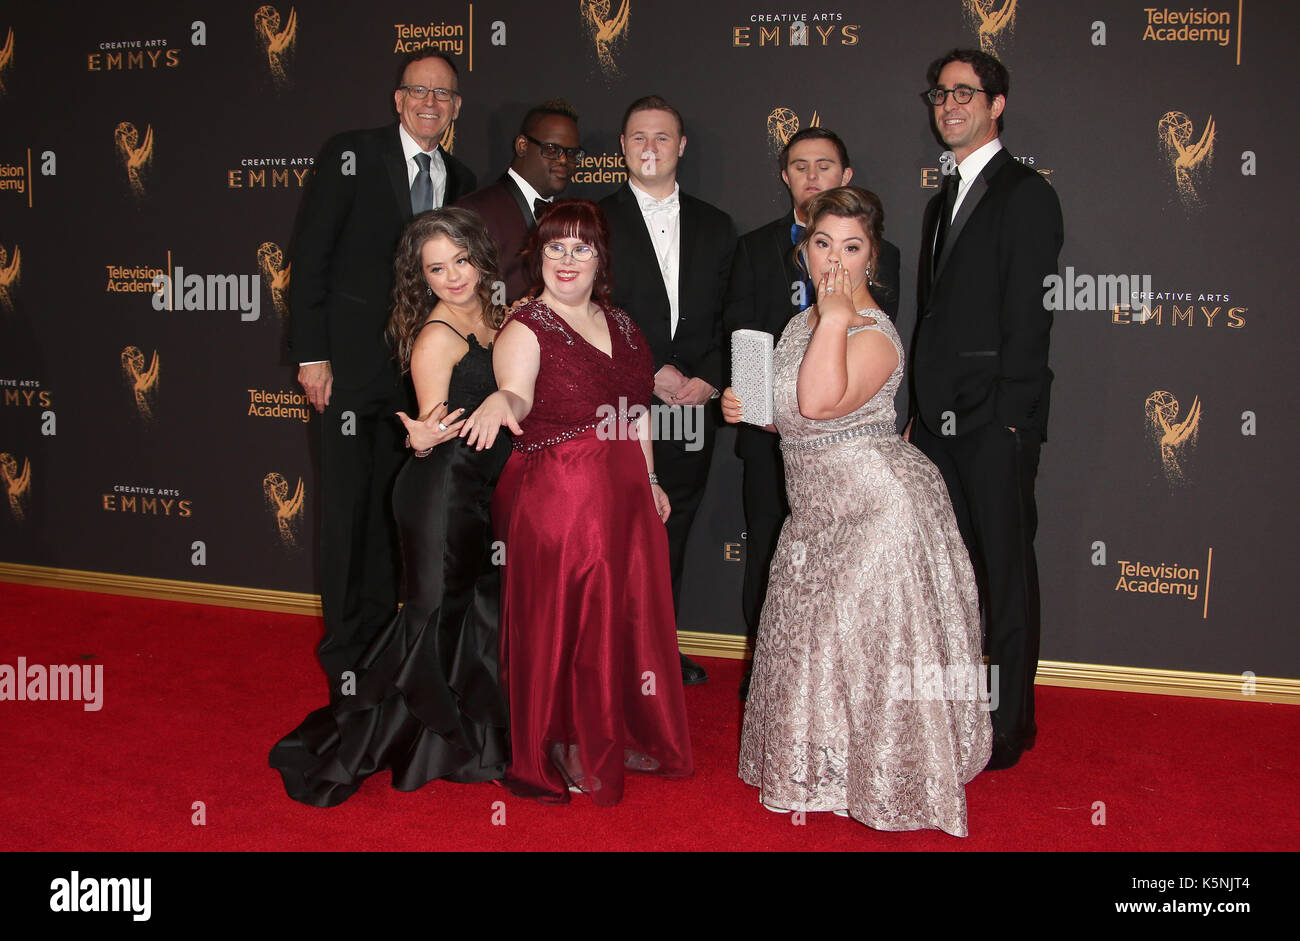 Born Emmy Stock Photos & Born Emmy Stock Images - Alamy